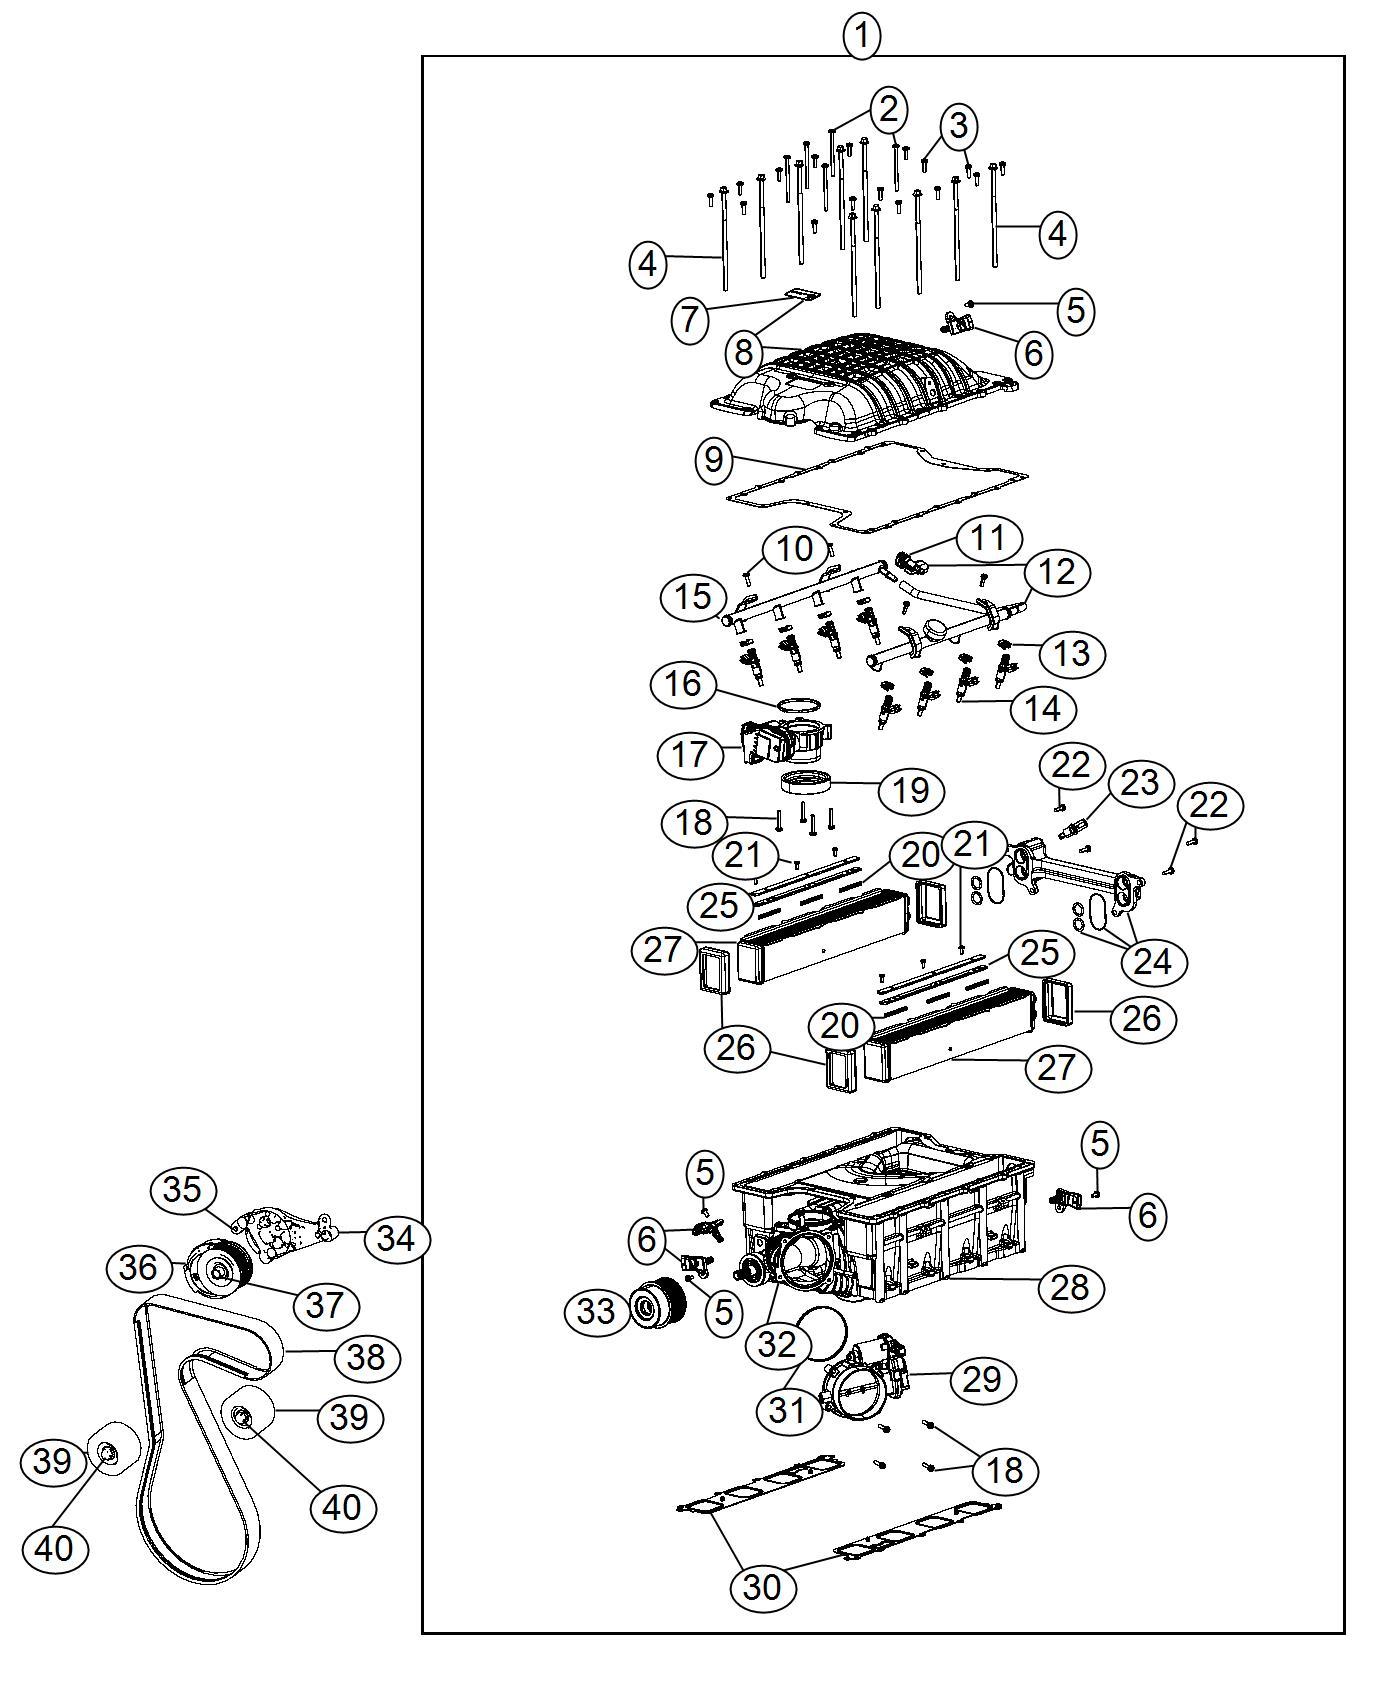 Dodge Charger Sensor. T/map. Supercharger, tmap